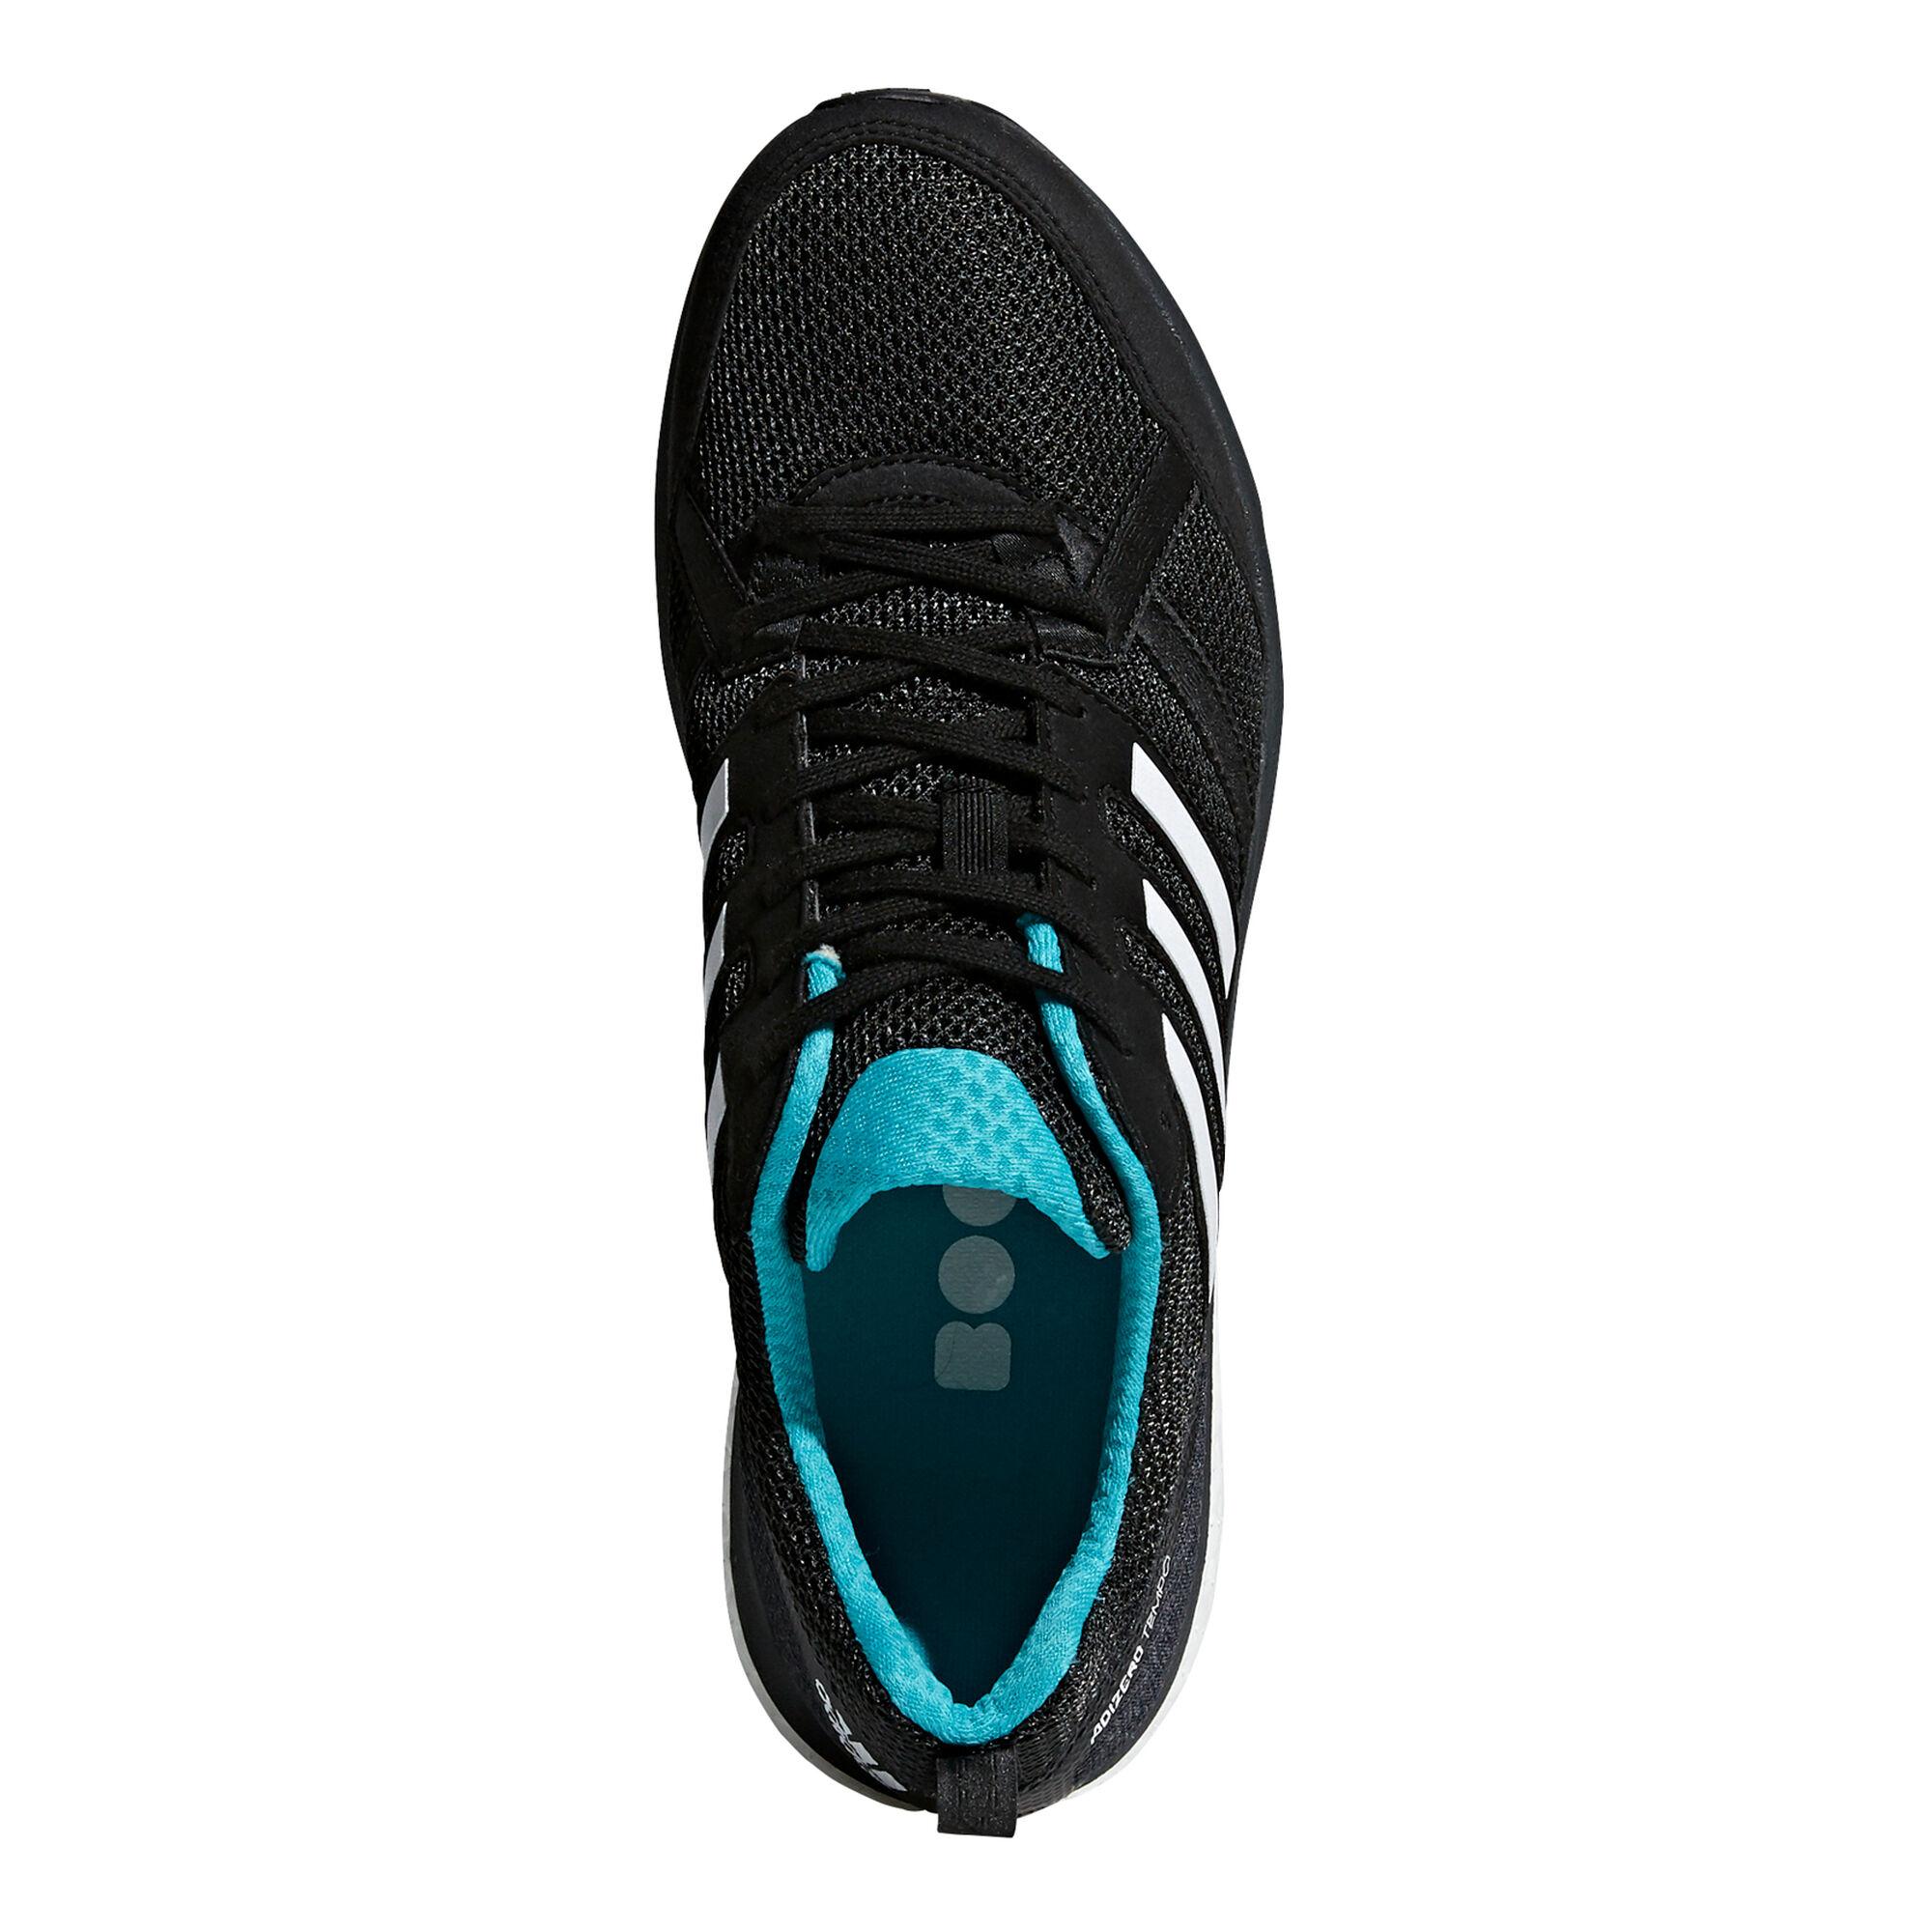 detailing 7884f 3bfef adidas · adidas · adidas · adidas · adidas · adidas · adidas · adidas ·  adidas. Adizero Tempo 9 ...